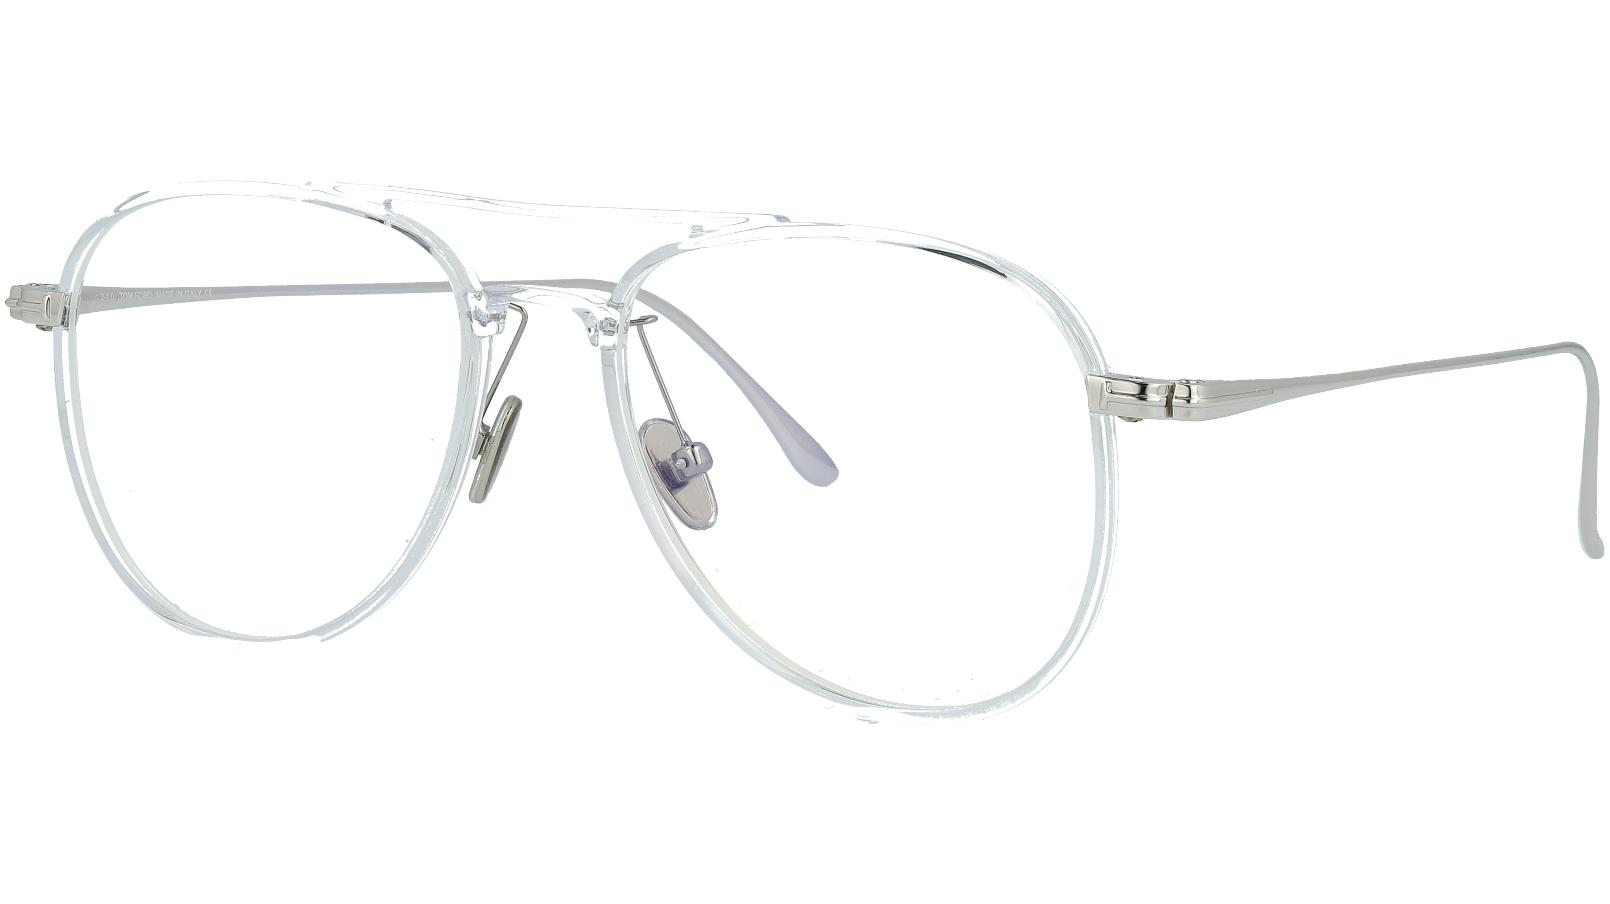 Tom Ford TF5666-B 026 52 CLEAR Glasses